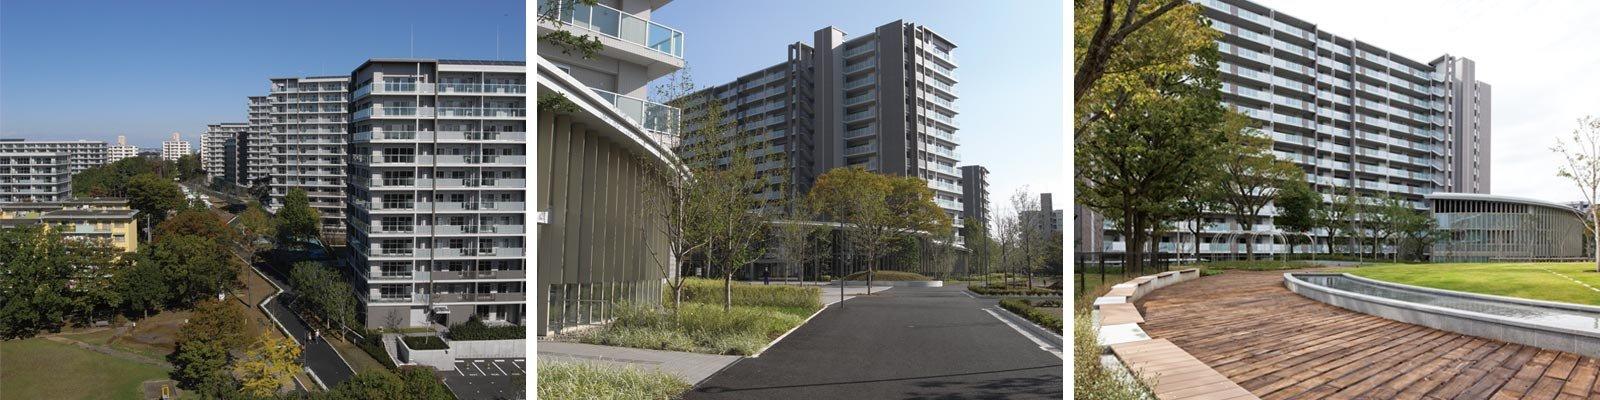 exterior_tamanewtown.jpg